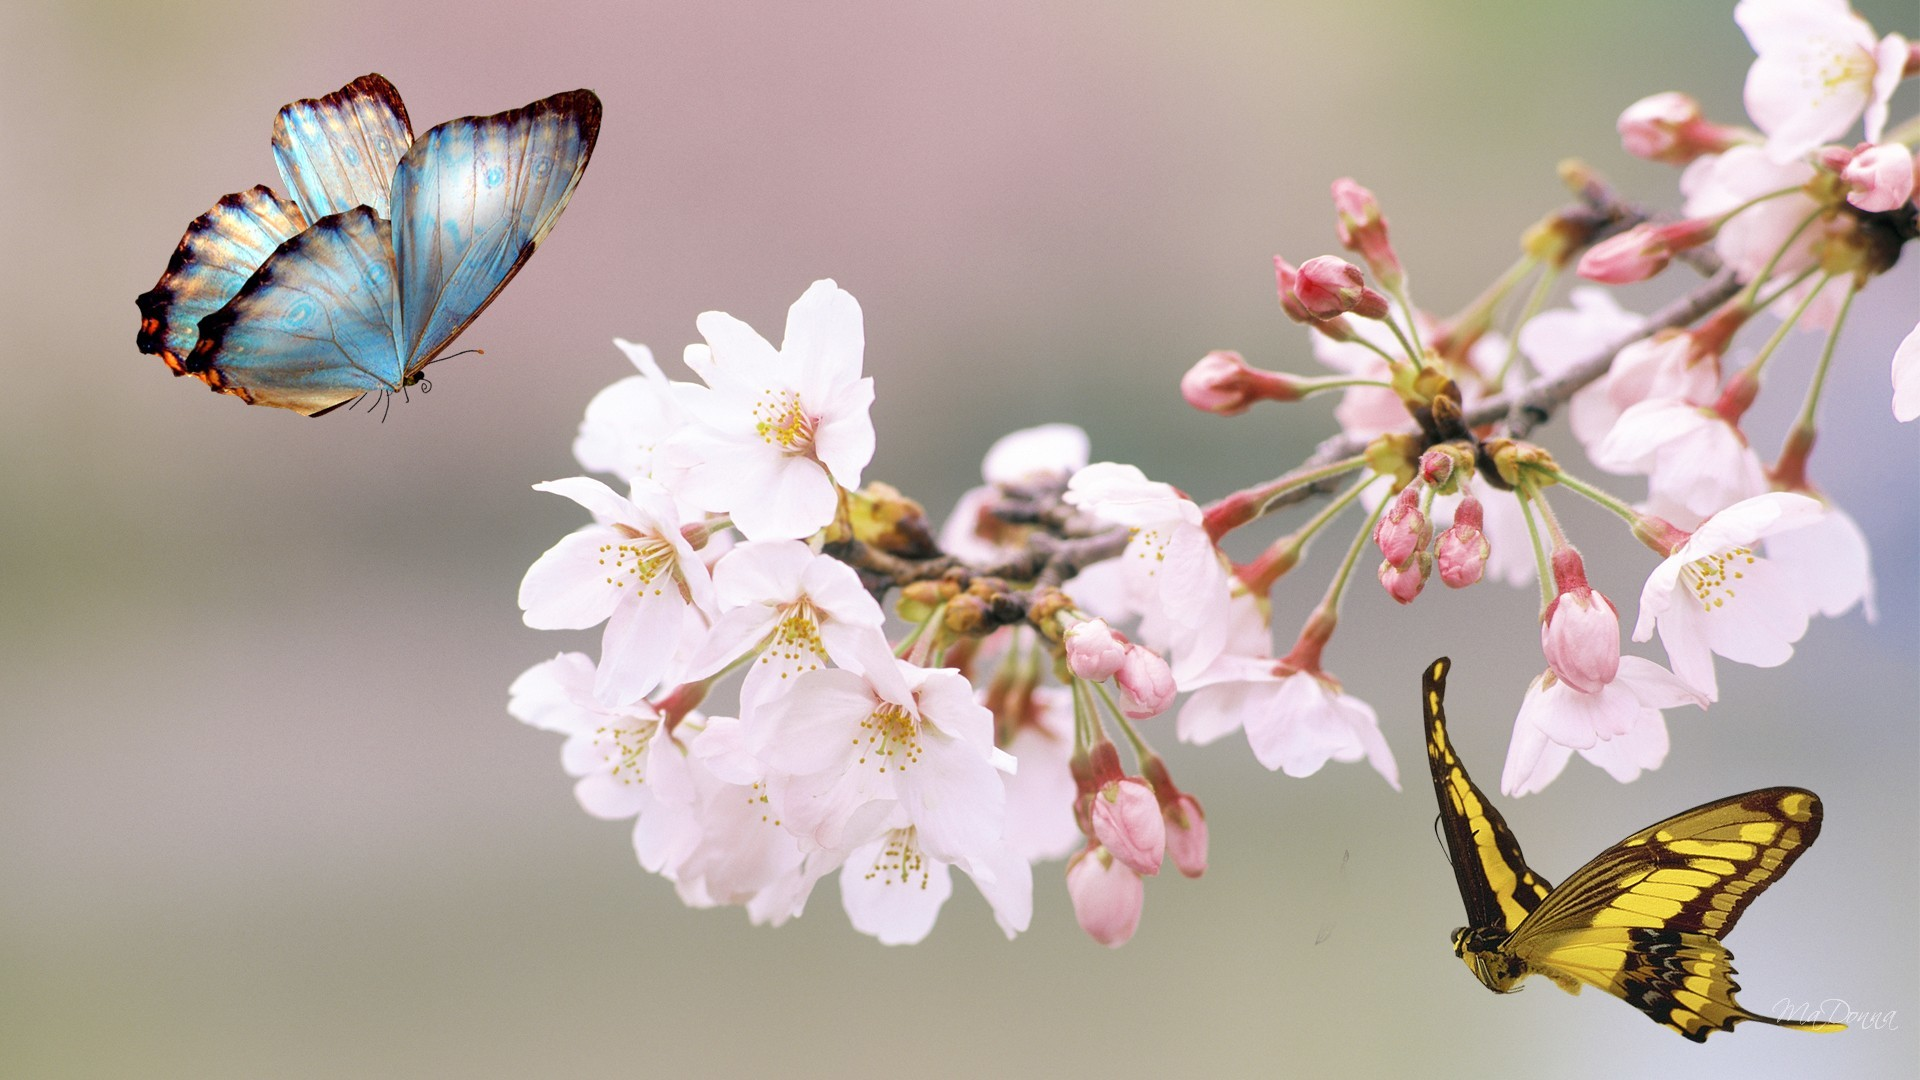 Sakura Tree Butterfly Flowers Japan Summer Free Hd Wallpapers Resolution :  Filesize : kB, Added on June Tagged : sakura tree